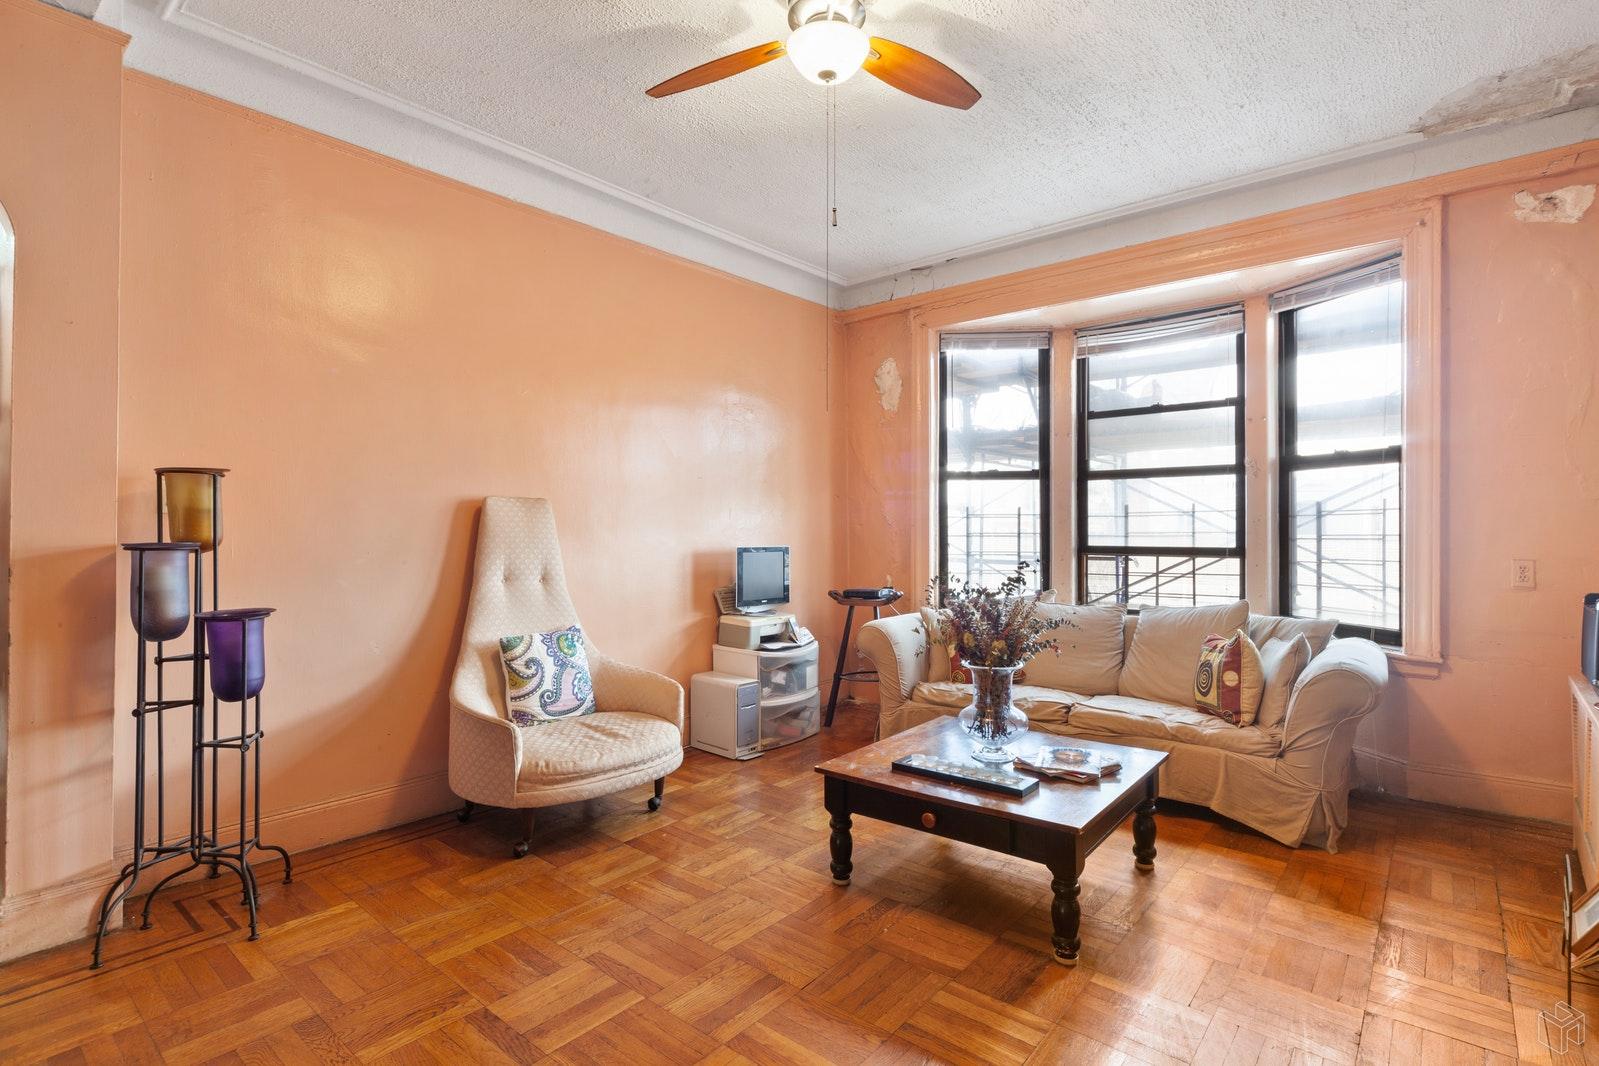 544 WEST 157TH STREET, Washington Heights, $465,000, Web #: 18965559